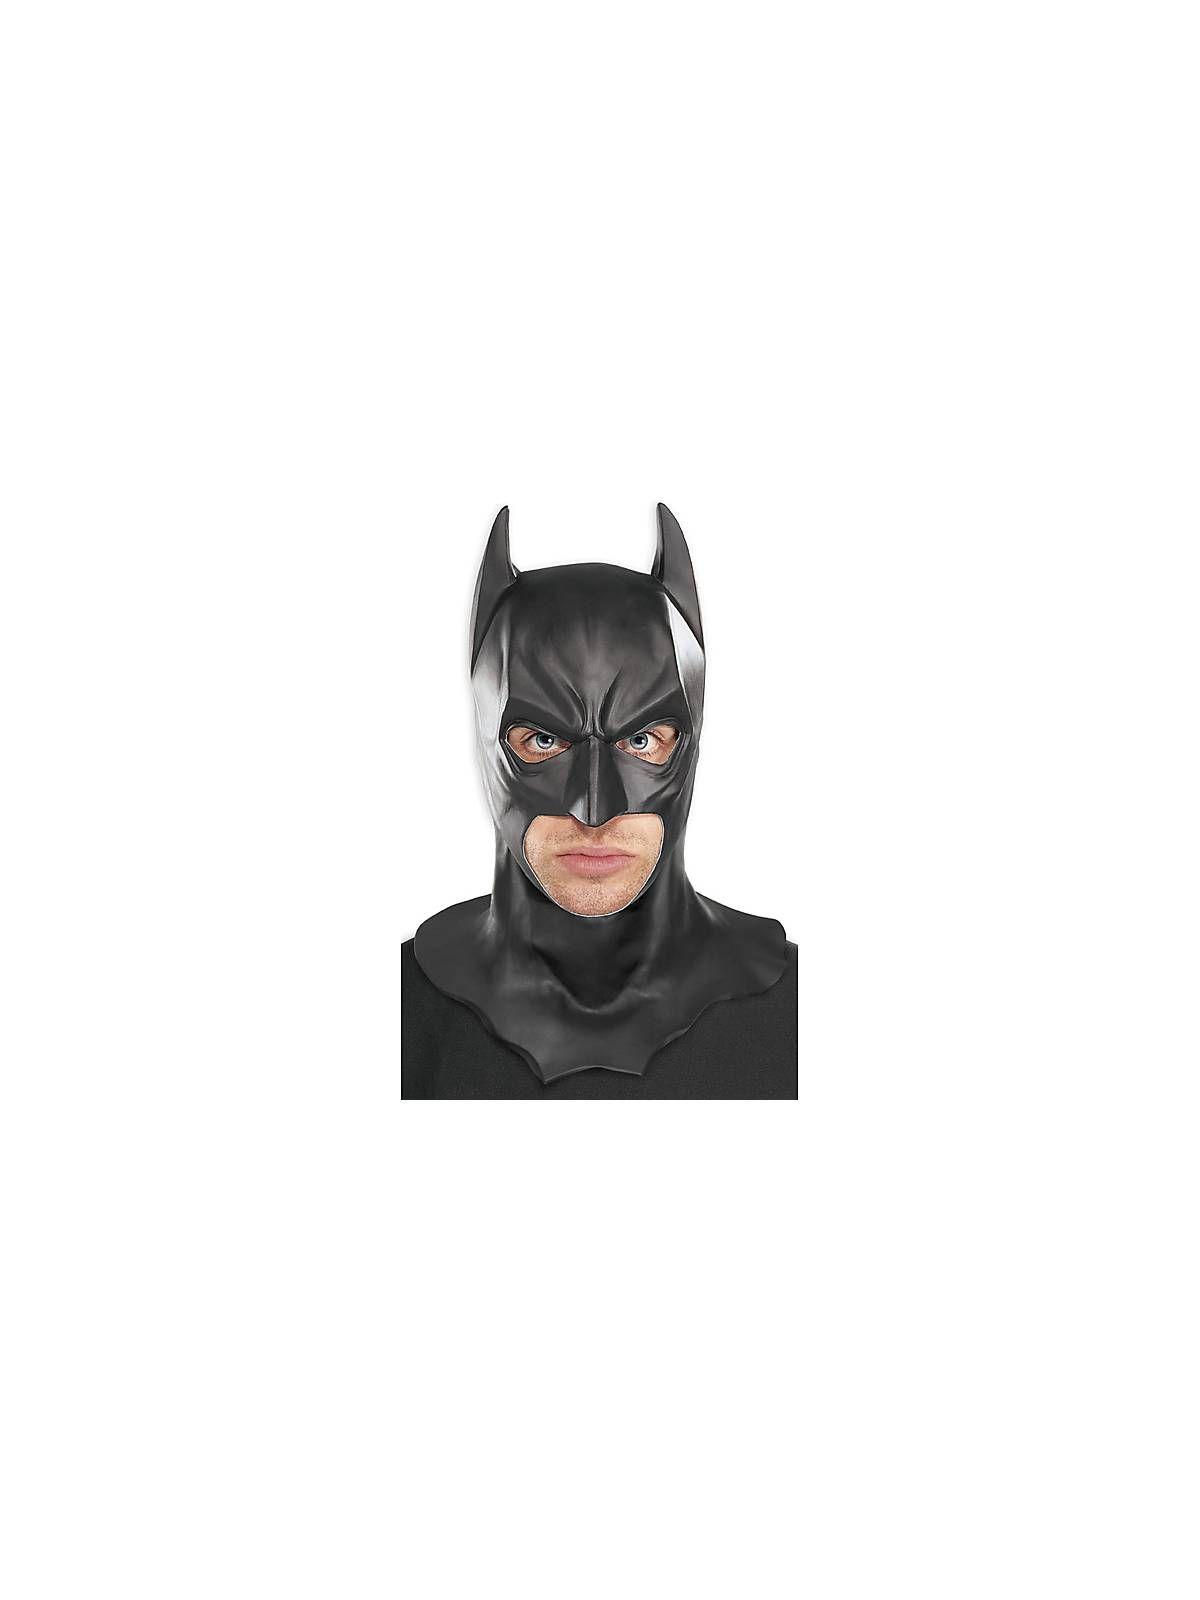 Batman Mask Superhero Costume Accessory Adult DC Comics Halloween